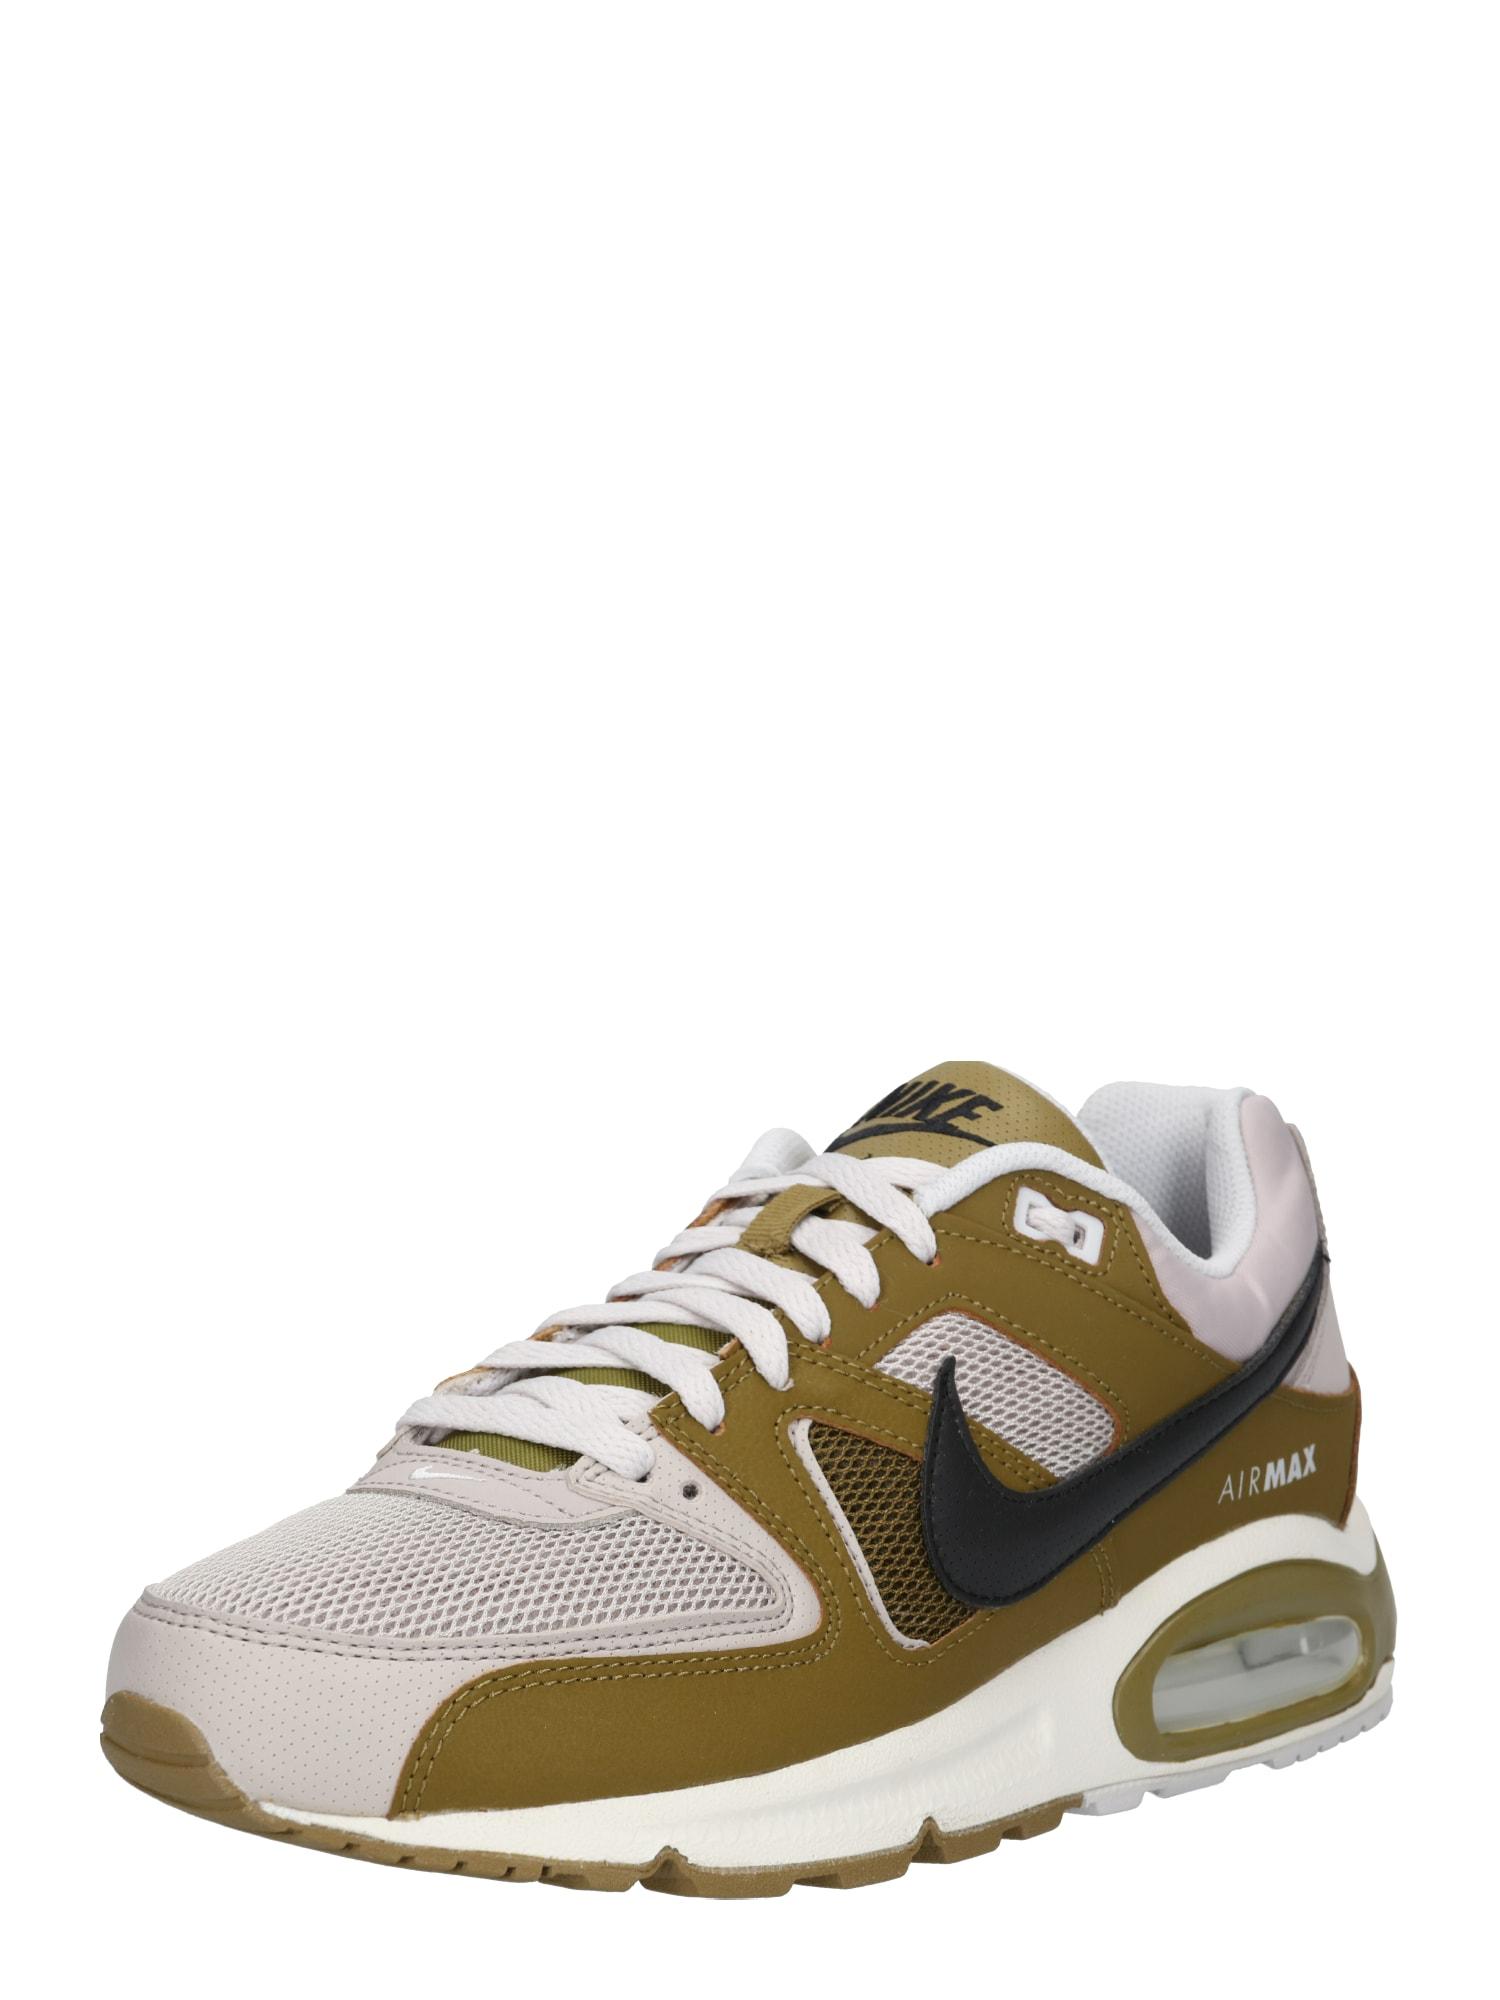 Sportscheck Schuhe Nike Damen Nike Schuhe Damen Sportscheck